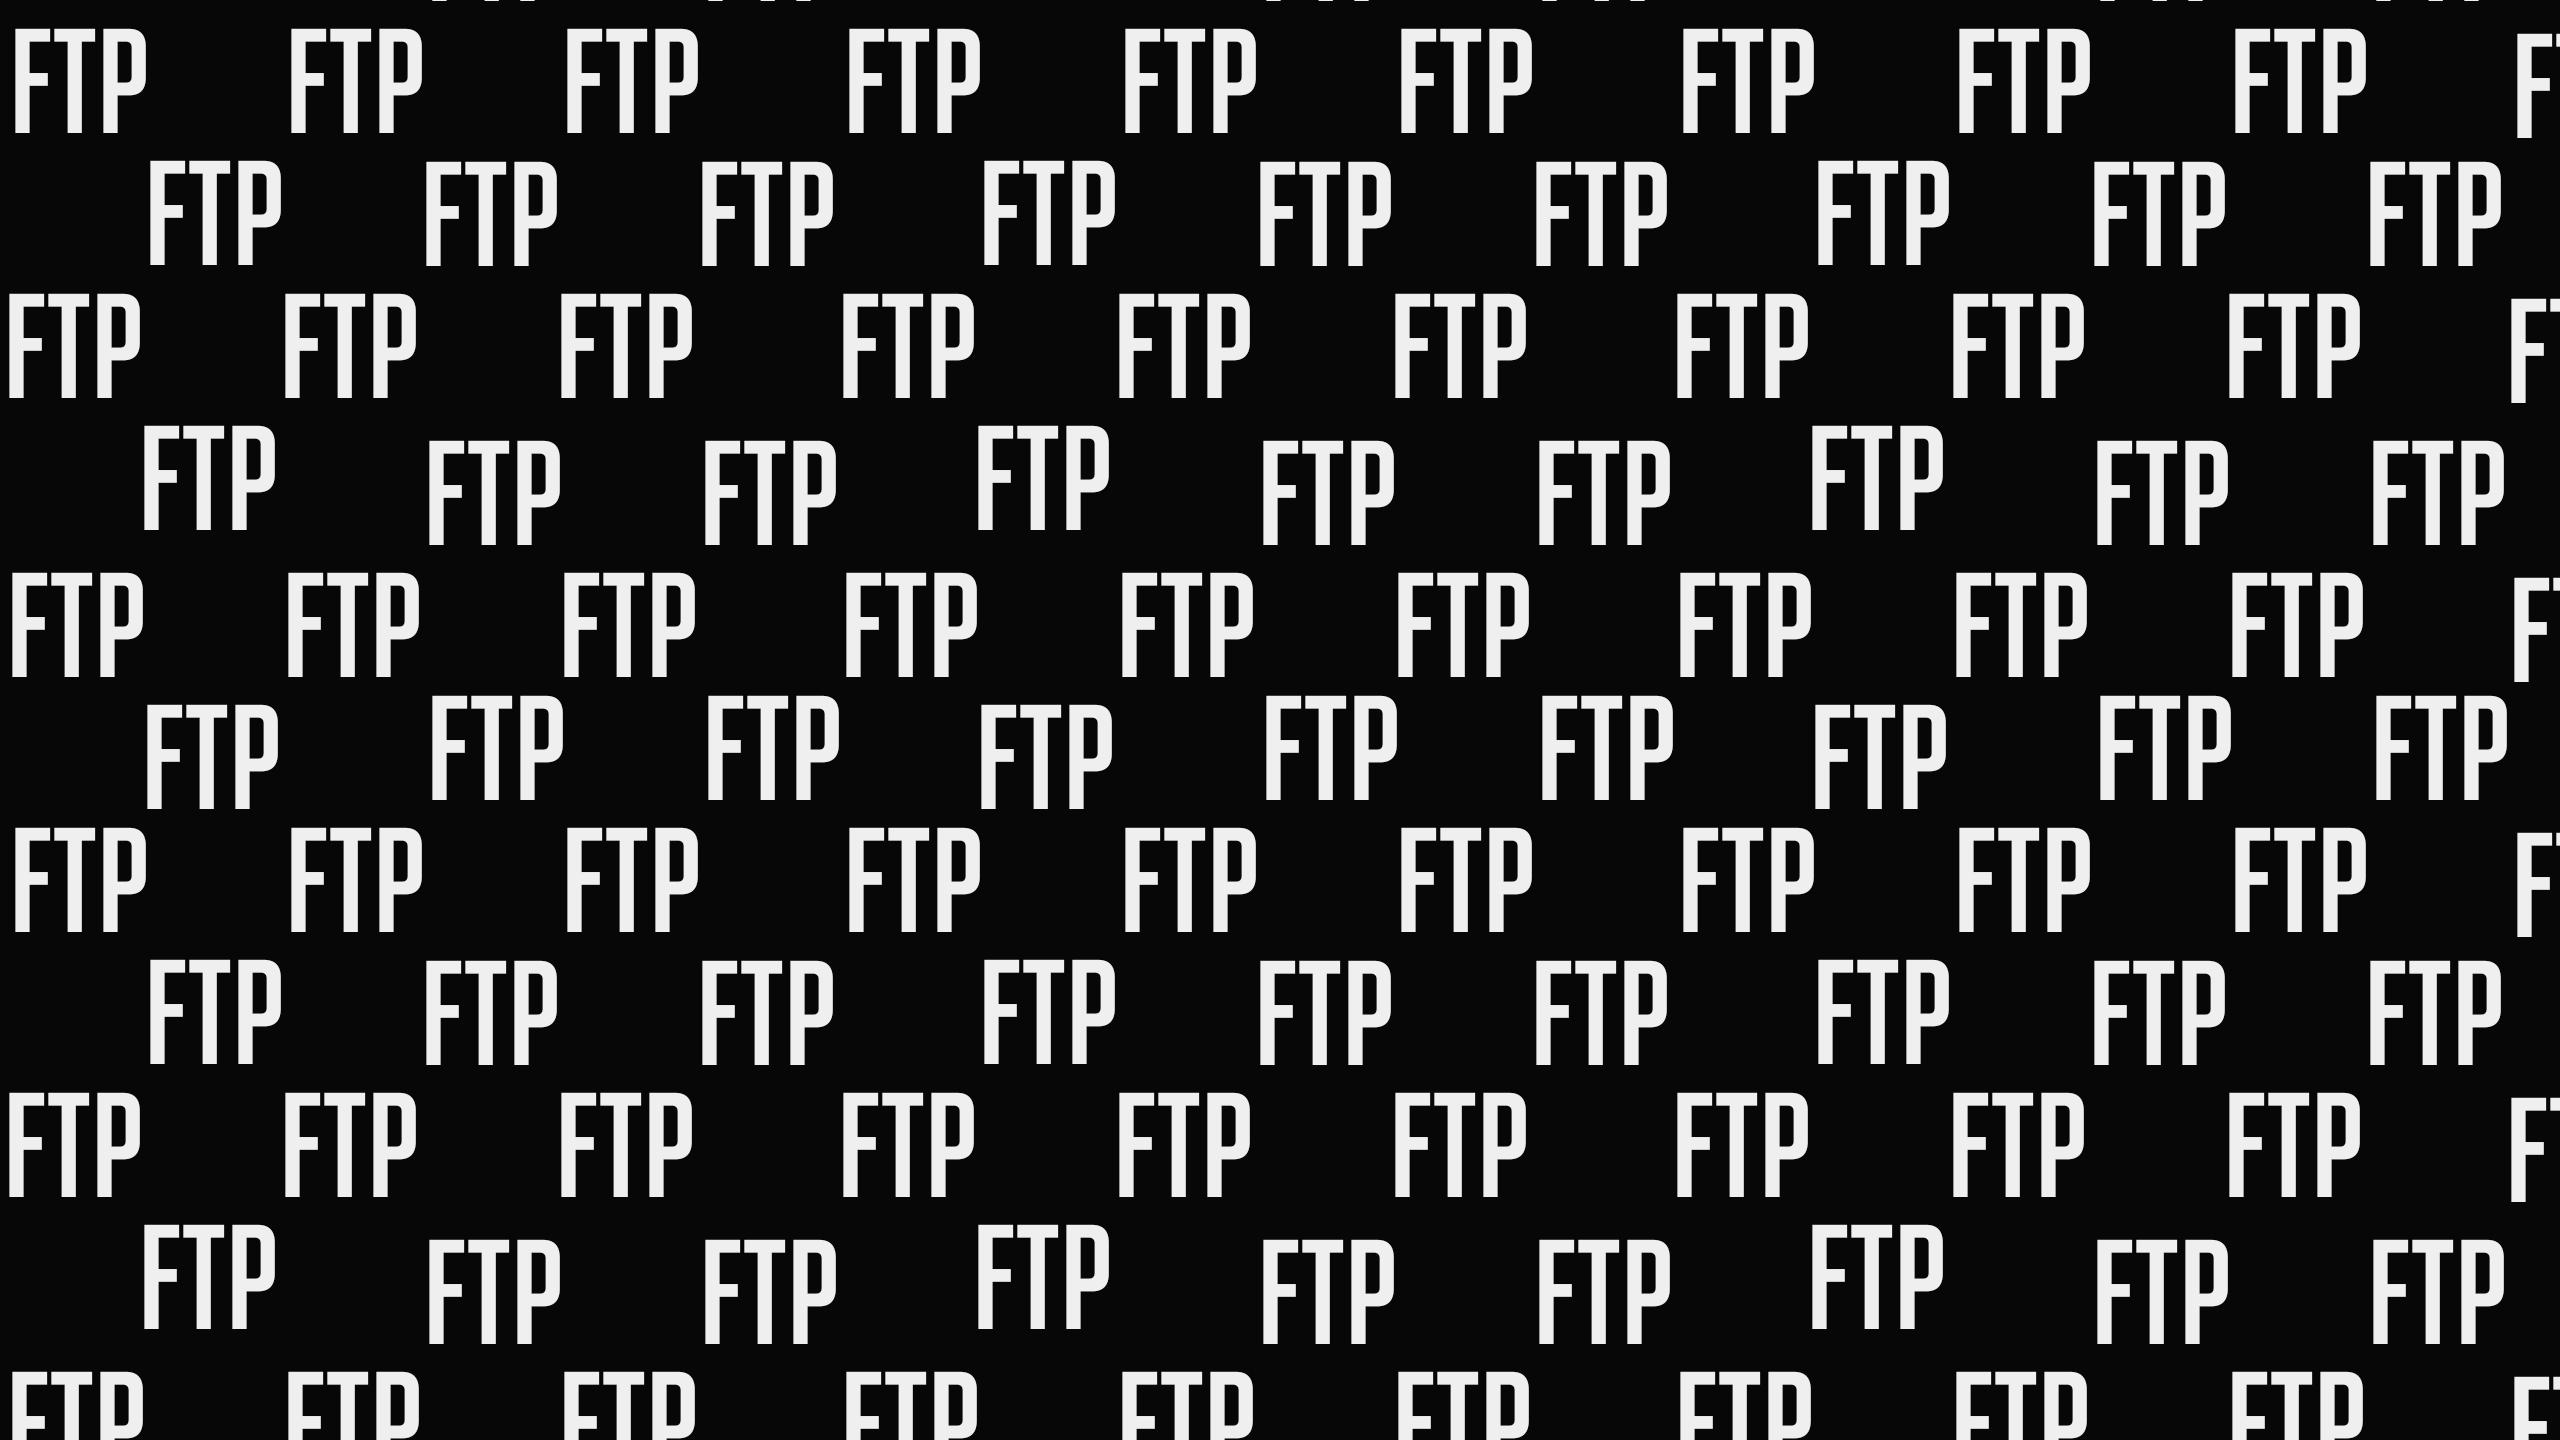 Ftp Vol2 By Onetallor On Deviantart